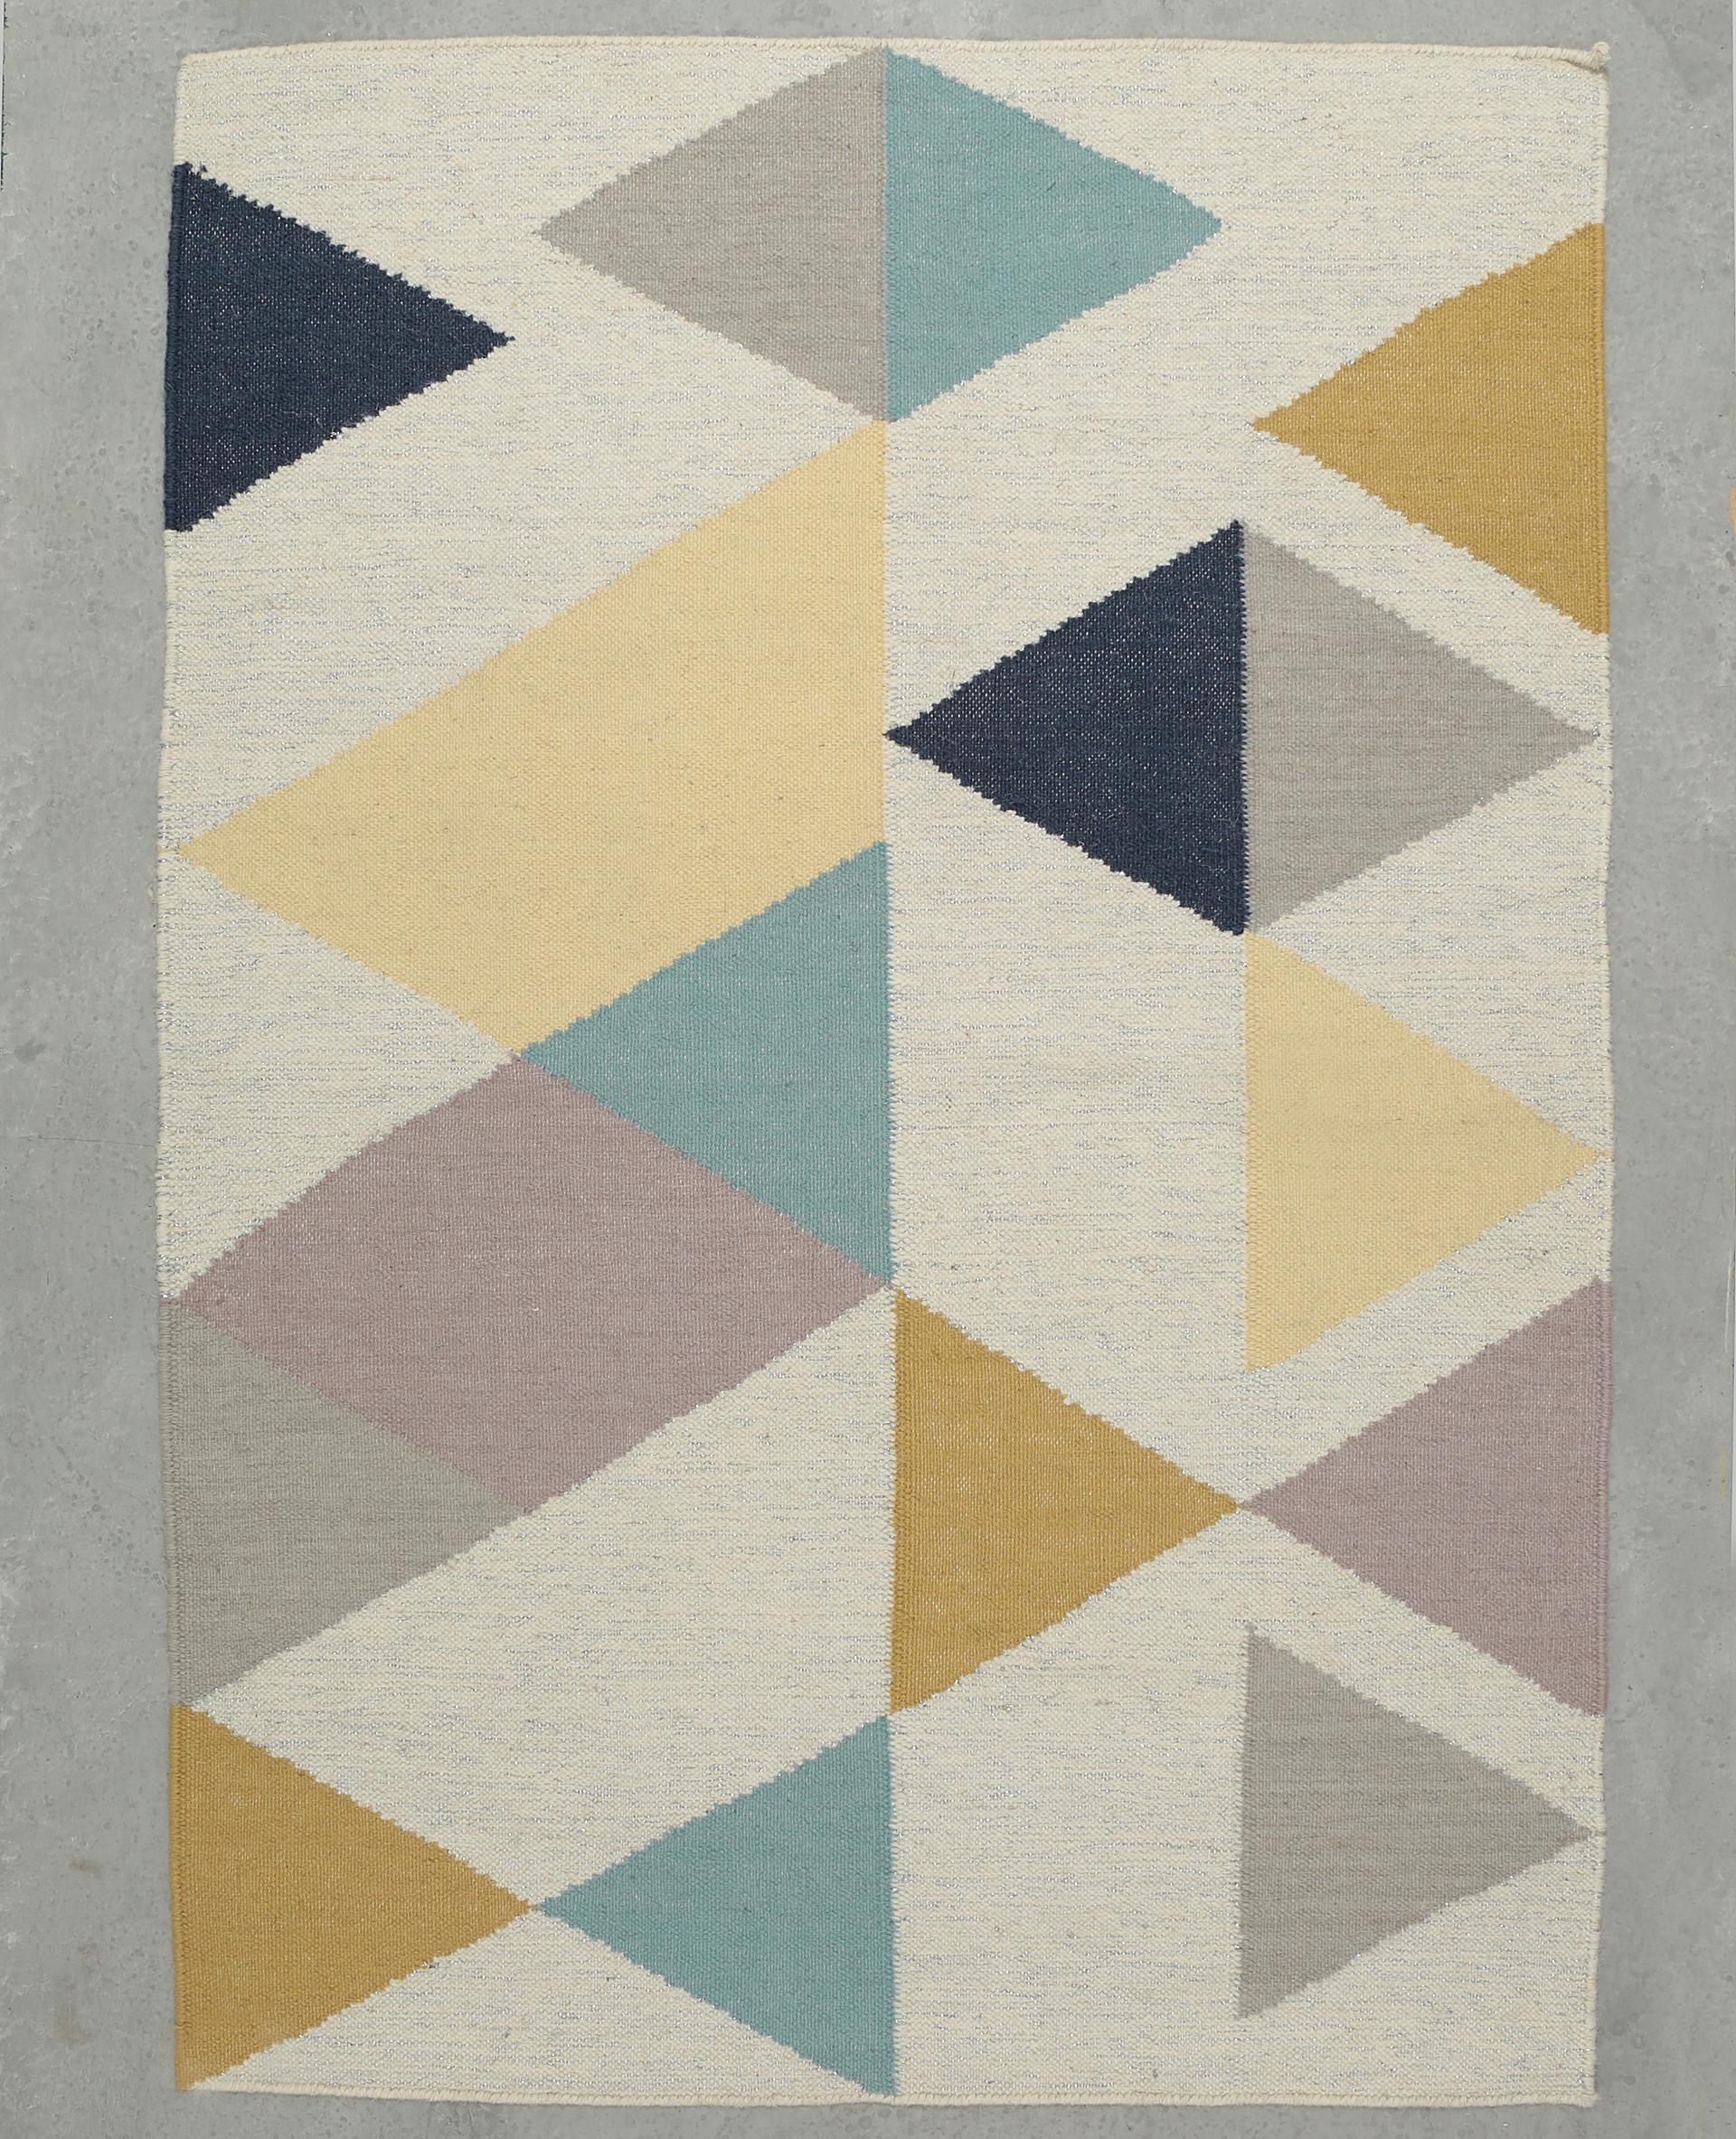 grand tapis multicolore et silver corail 902834a20i0a pimkie. Black Bedroom Furniture Sets. Home Design Ideas